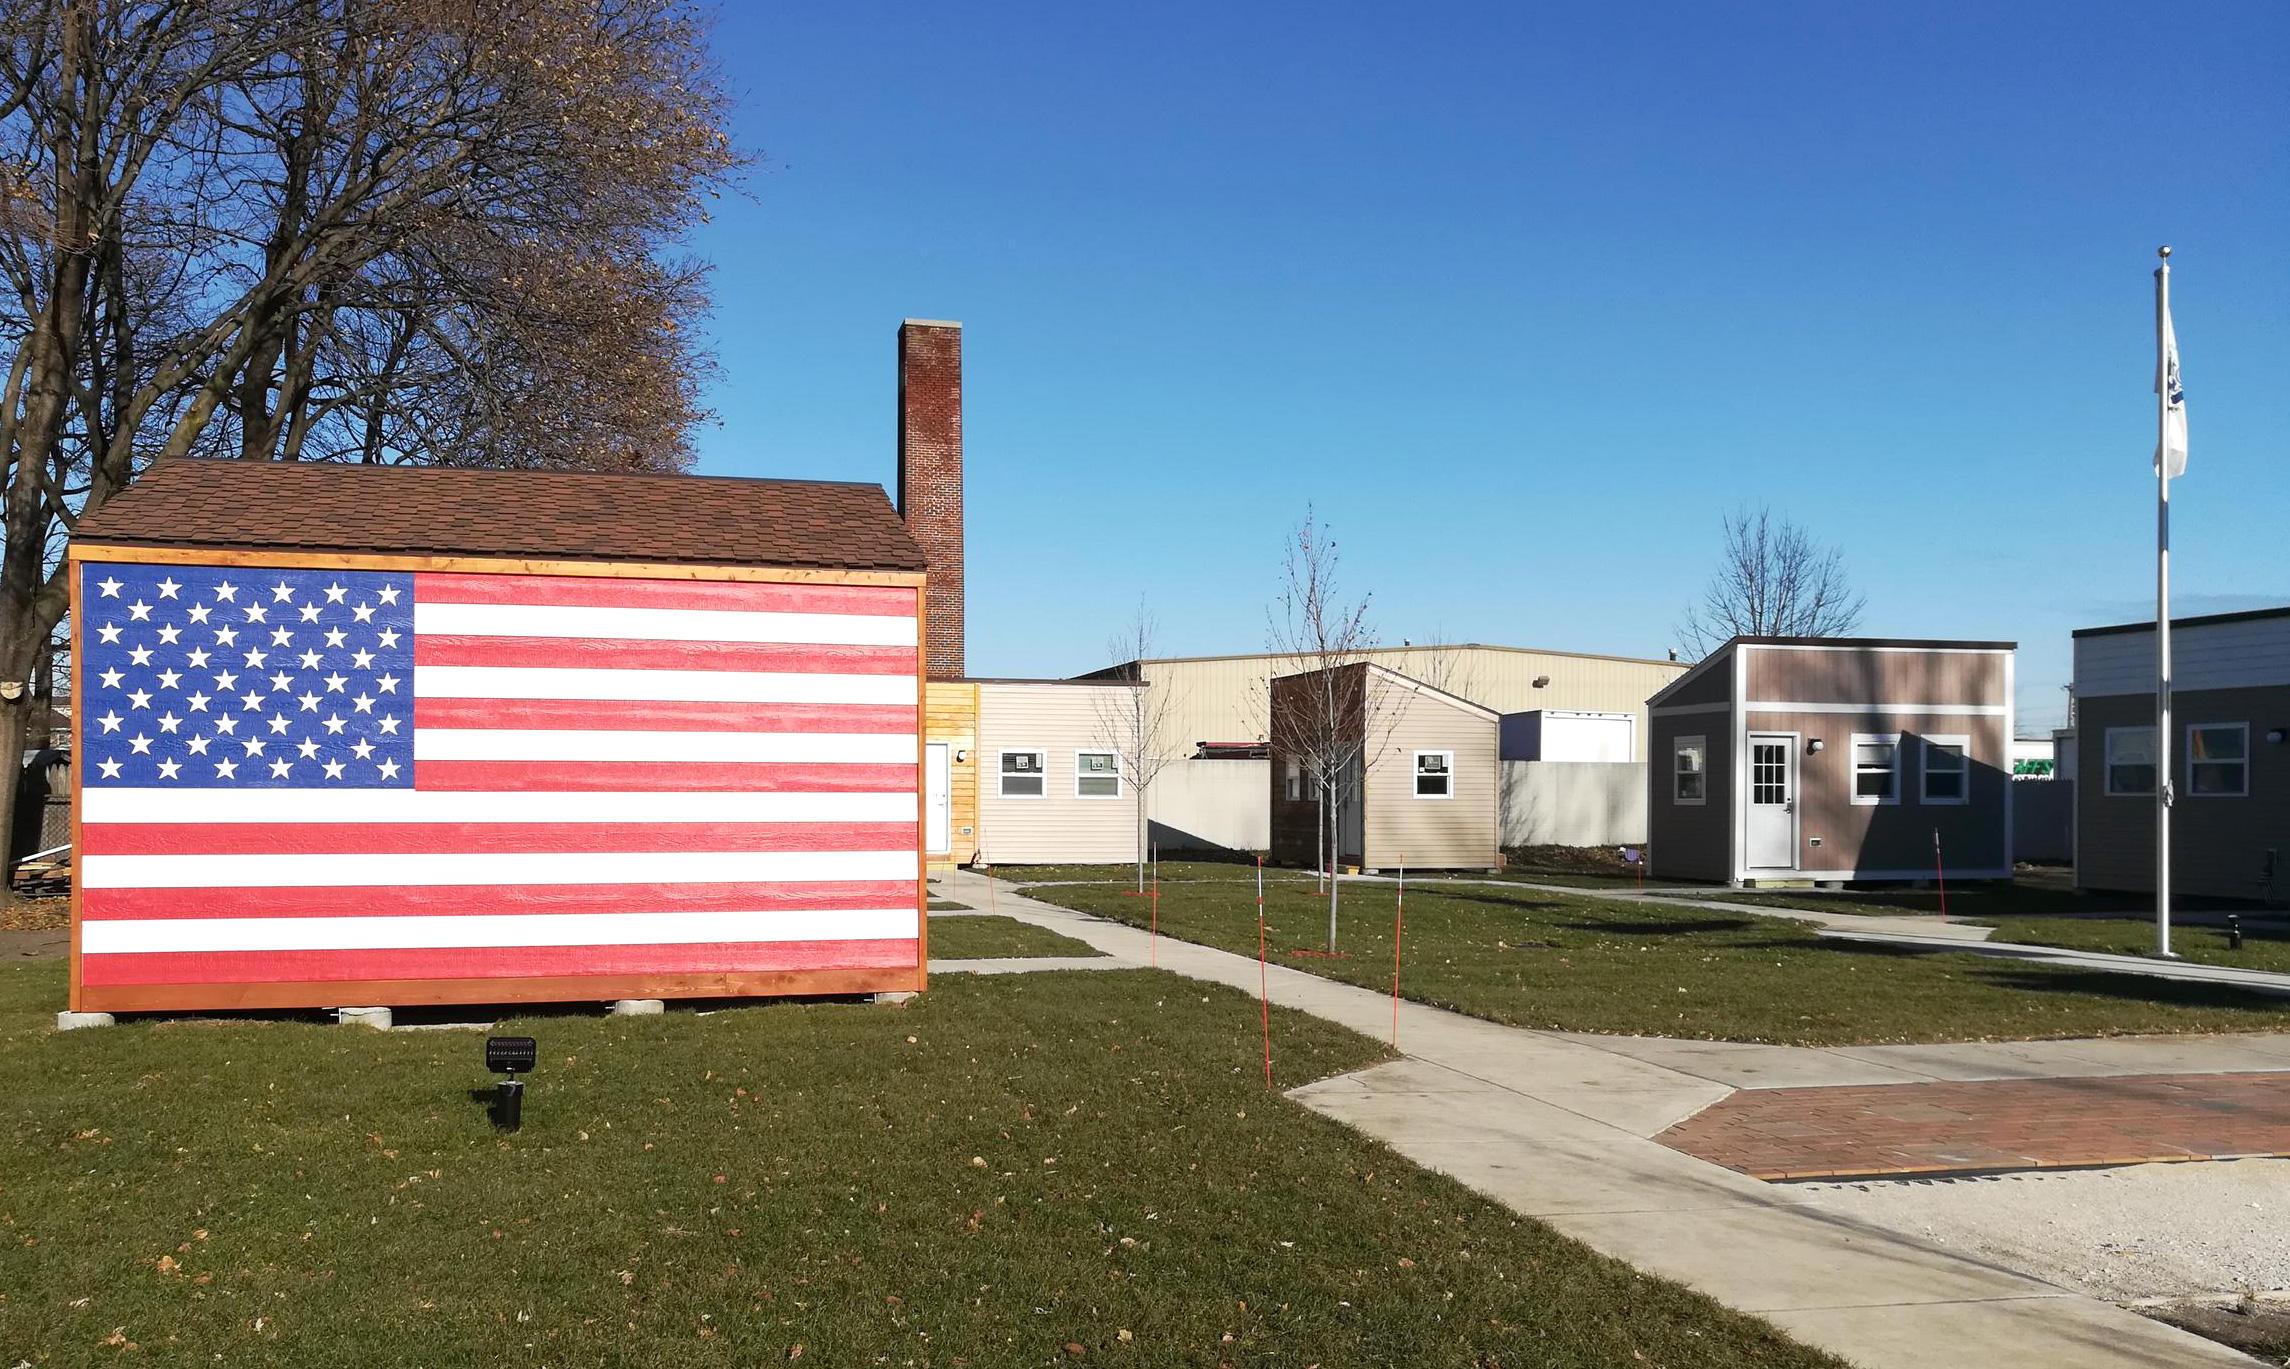 homeless no more tiny home community houses veterans in racine wuwm